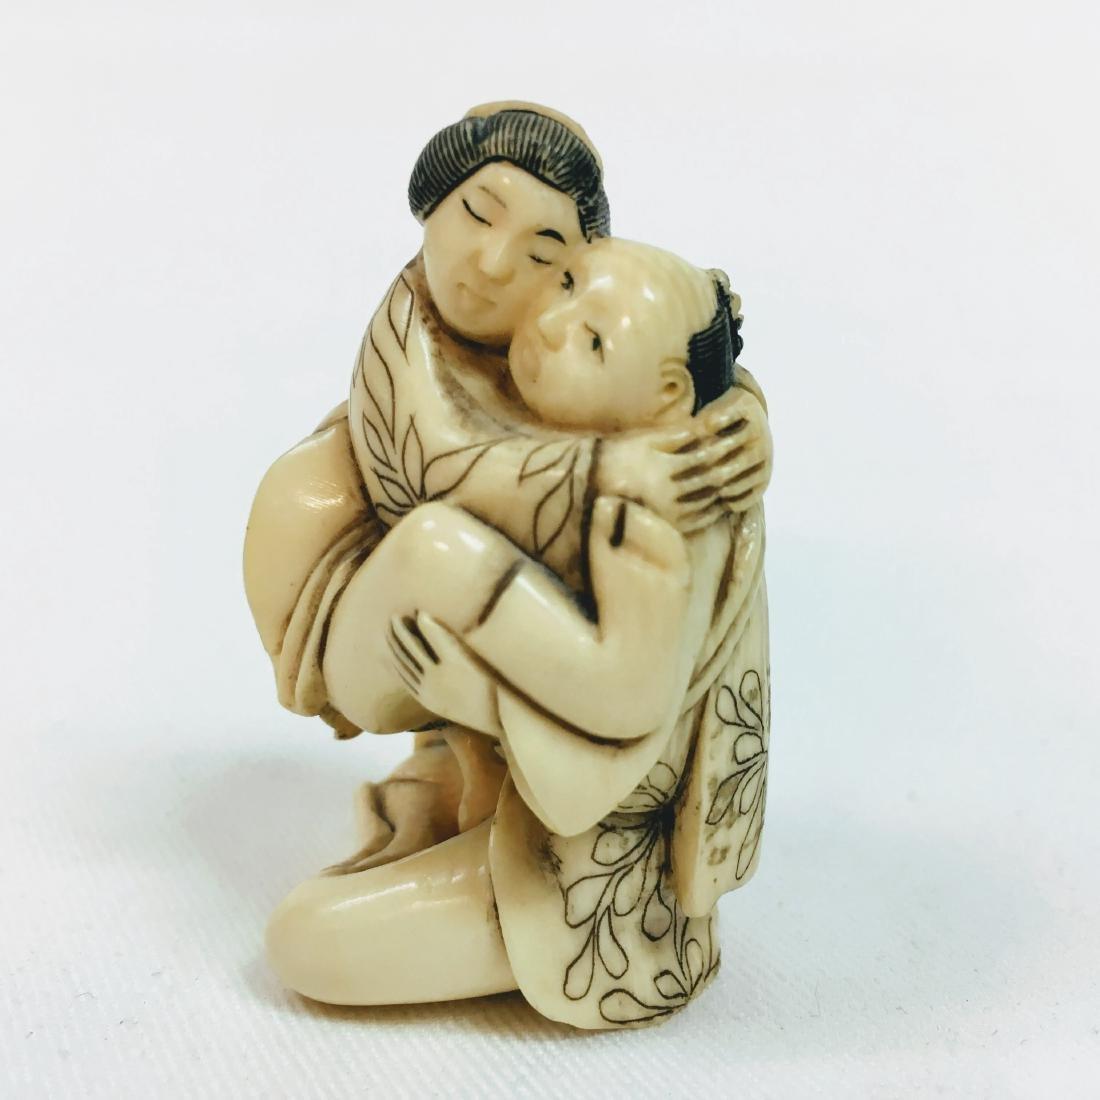 19th Century Erotic Netsuke man with woman figure